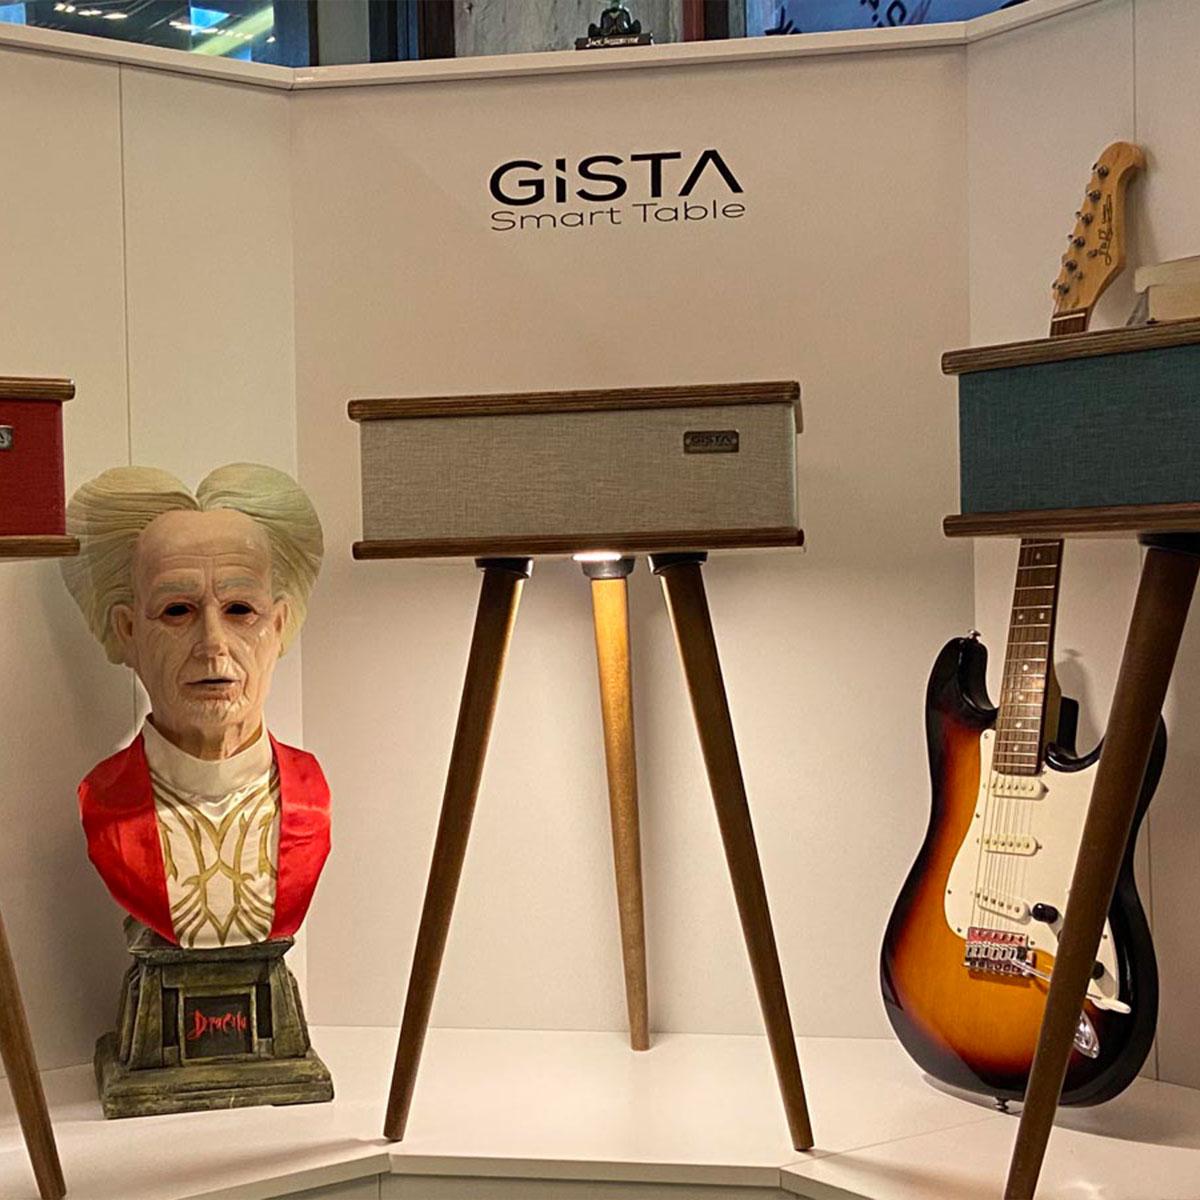 Gista-Smart-Table-Akıllı-Sehpa-12